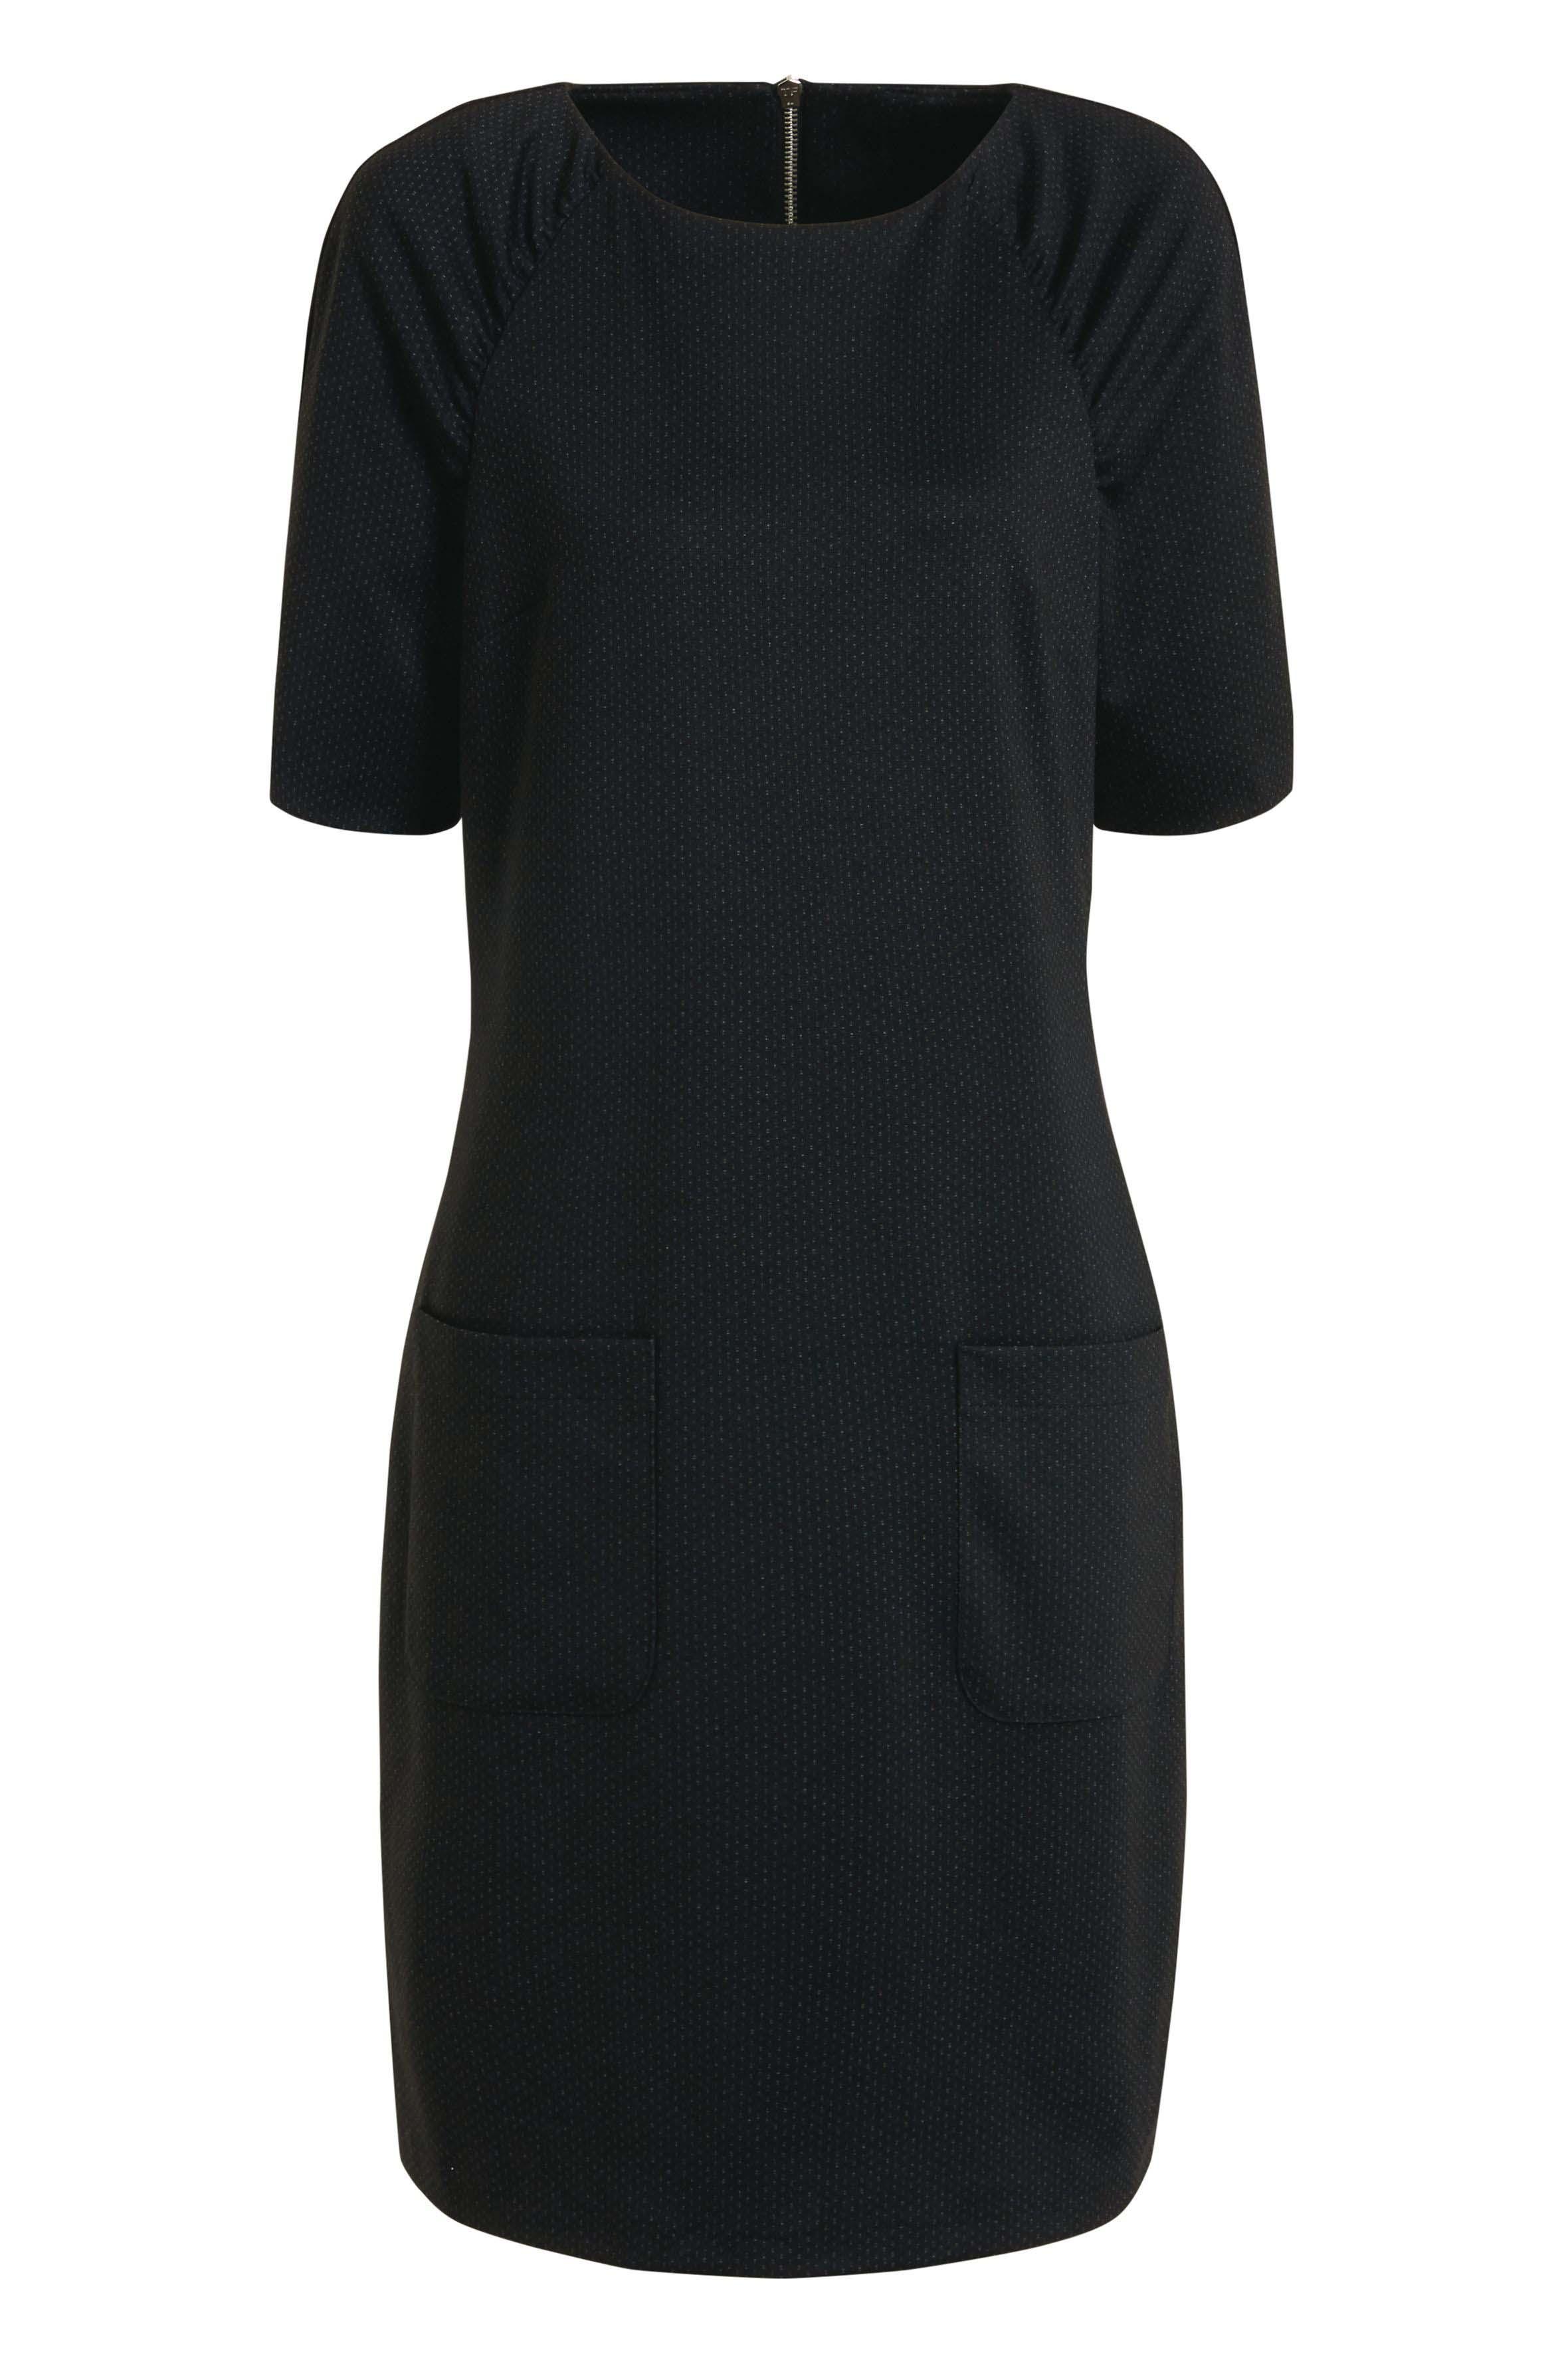 Womens Next Black/Grey Ponte Shift Dress -  Black